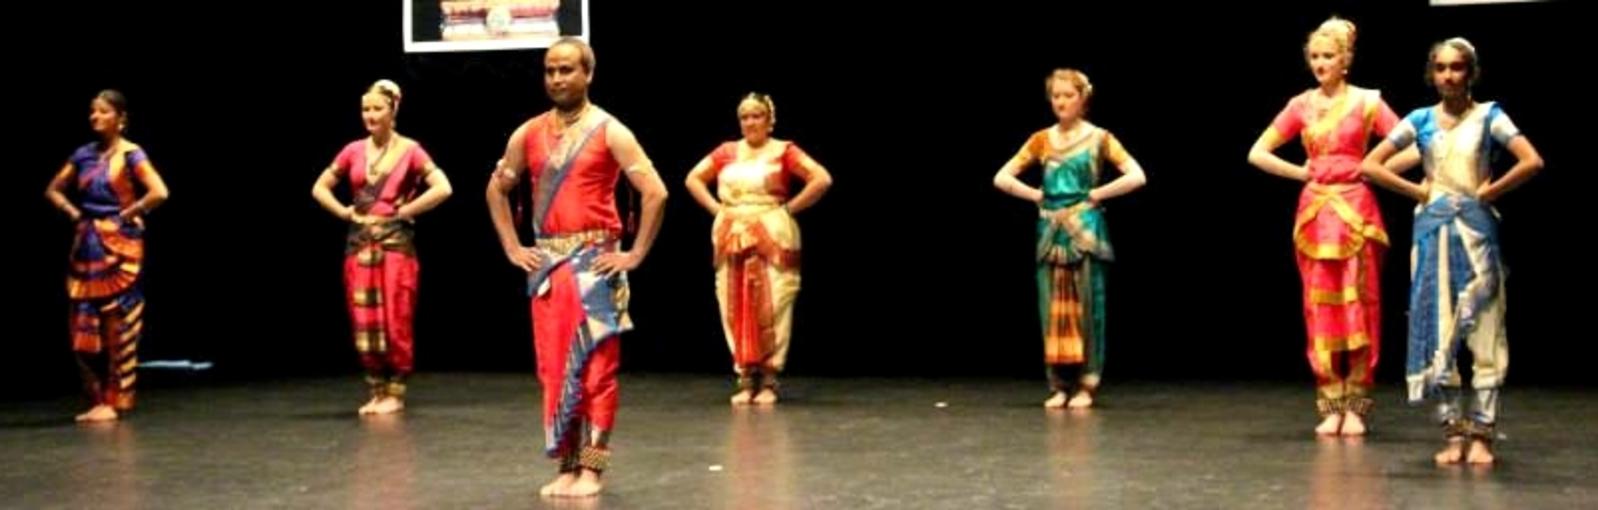 Bharata Natyam intermédiaires - Association Mira-Baï